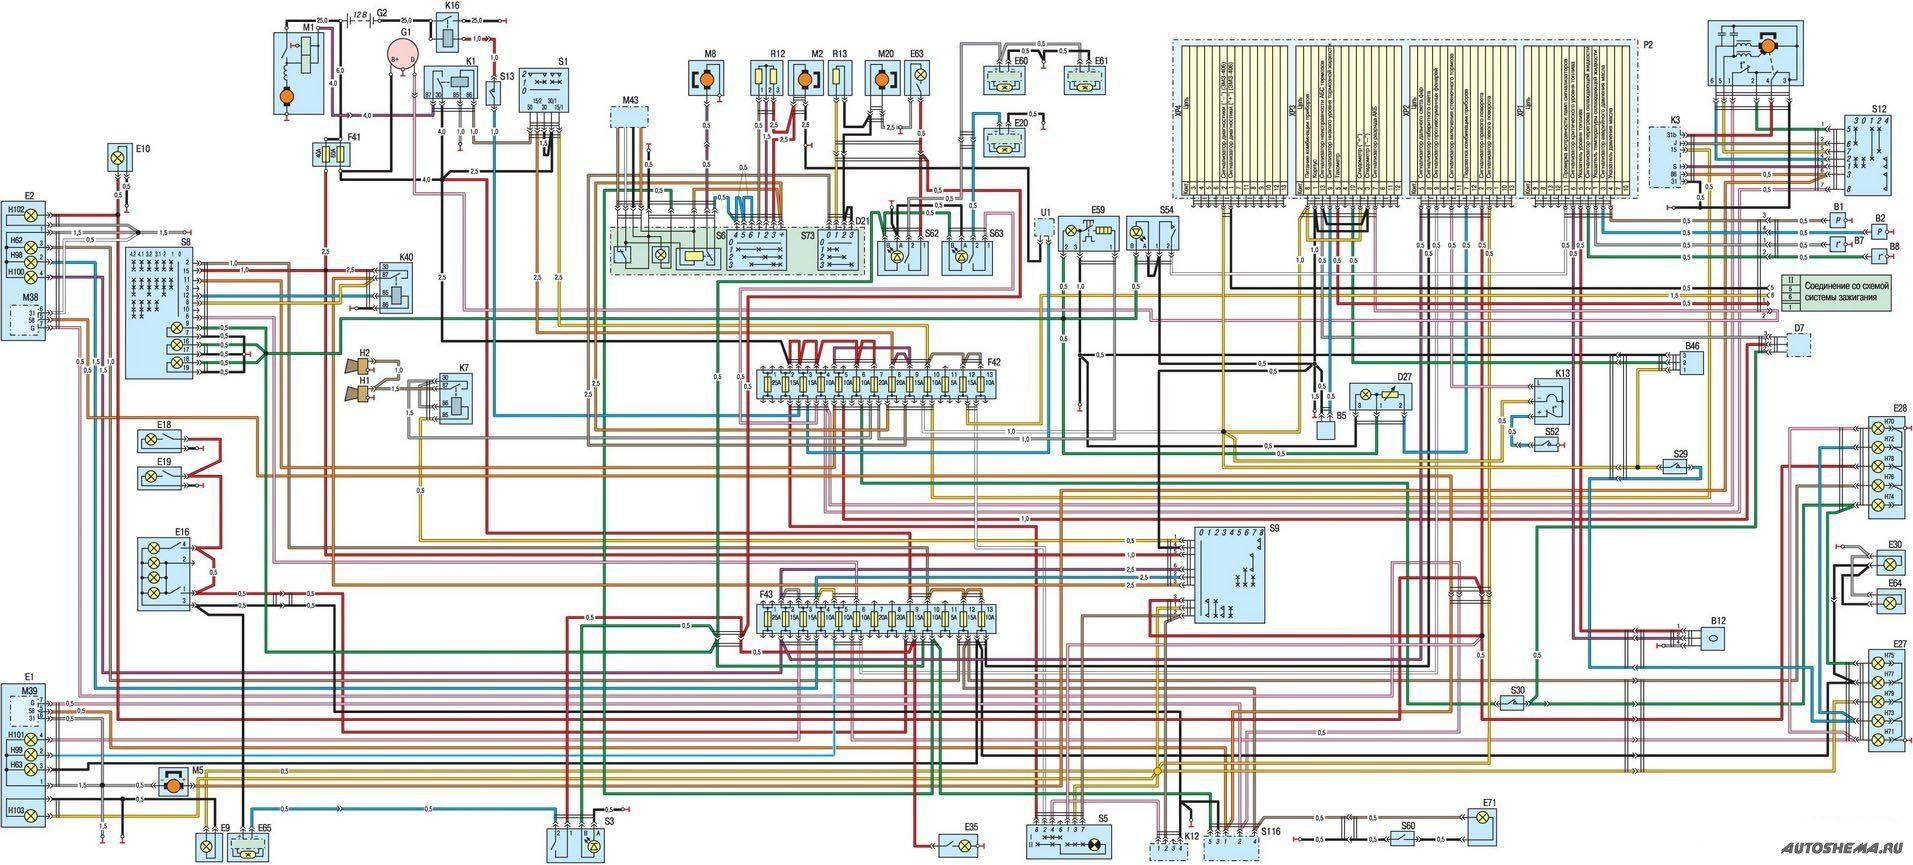 shema-elektroprovodki-gazel-406.jpg